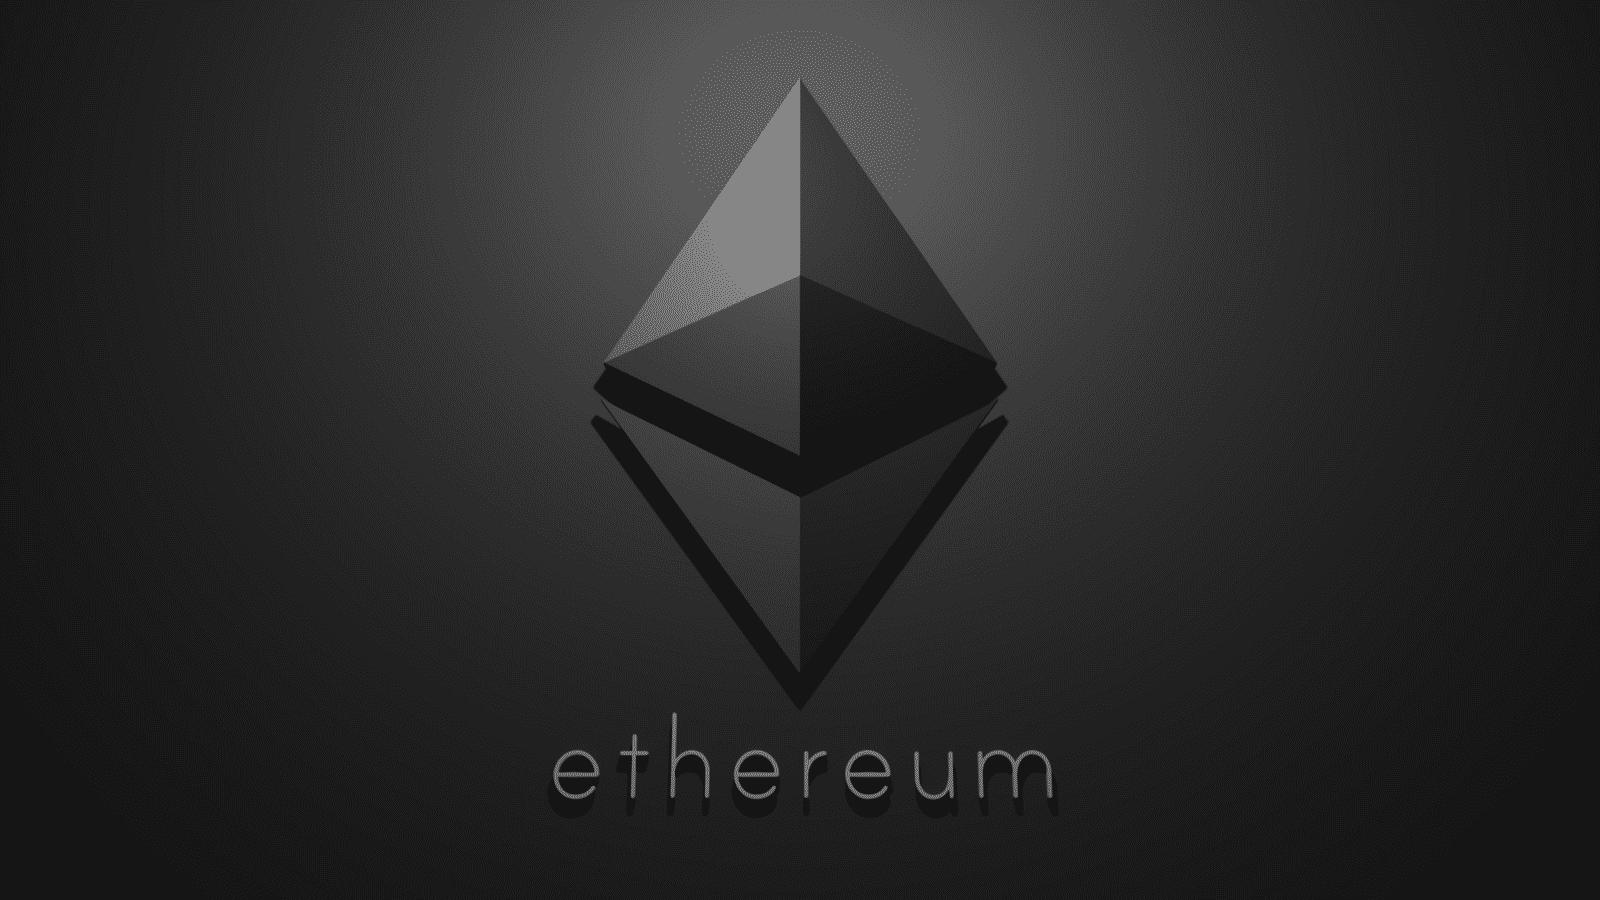 Will Ethereum (ETH) Remains Under Bearish Pressure?